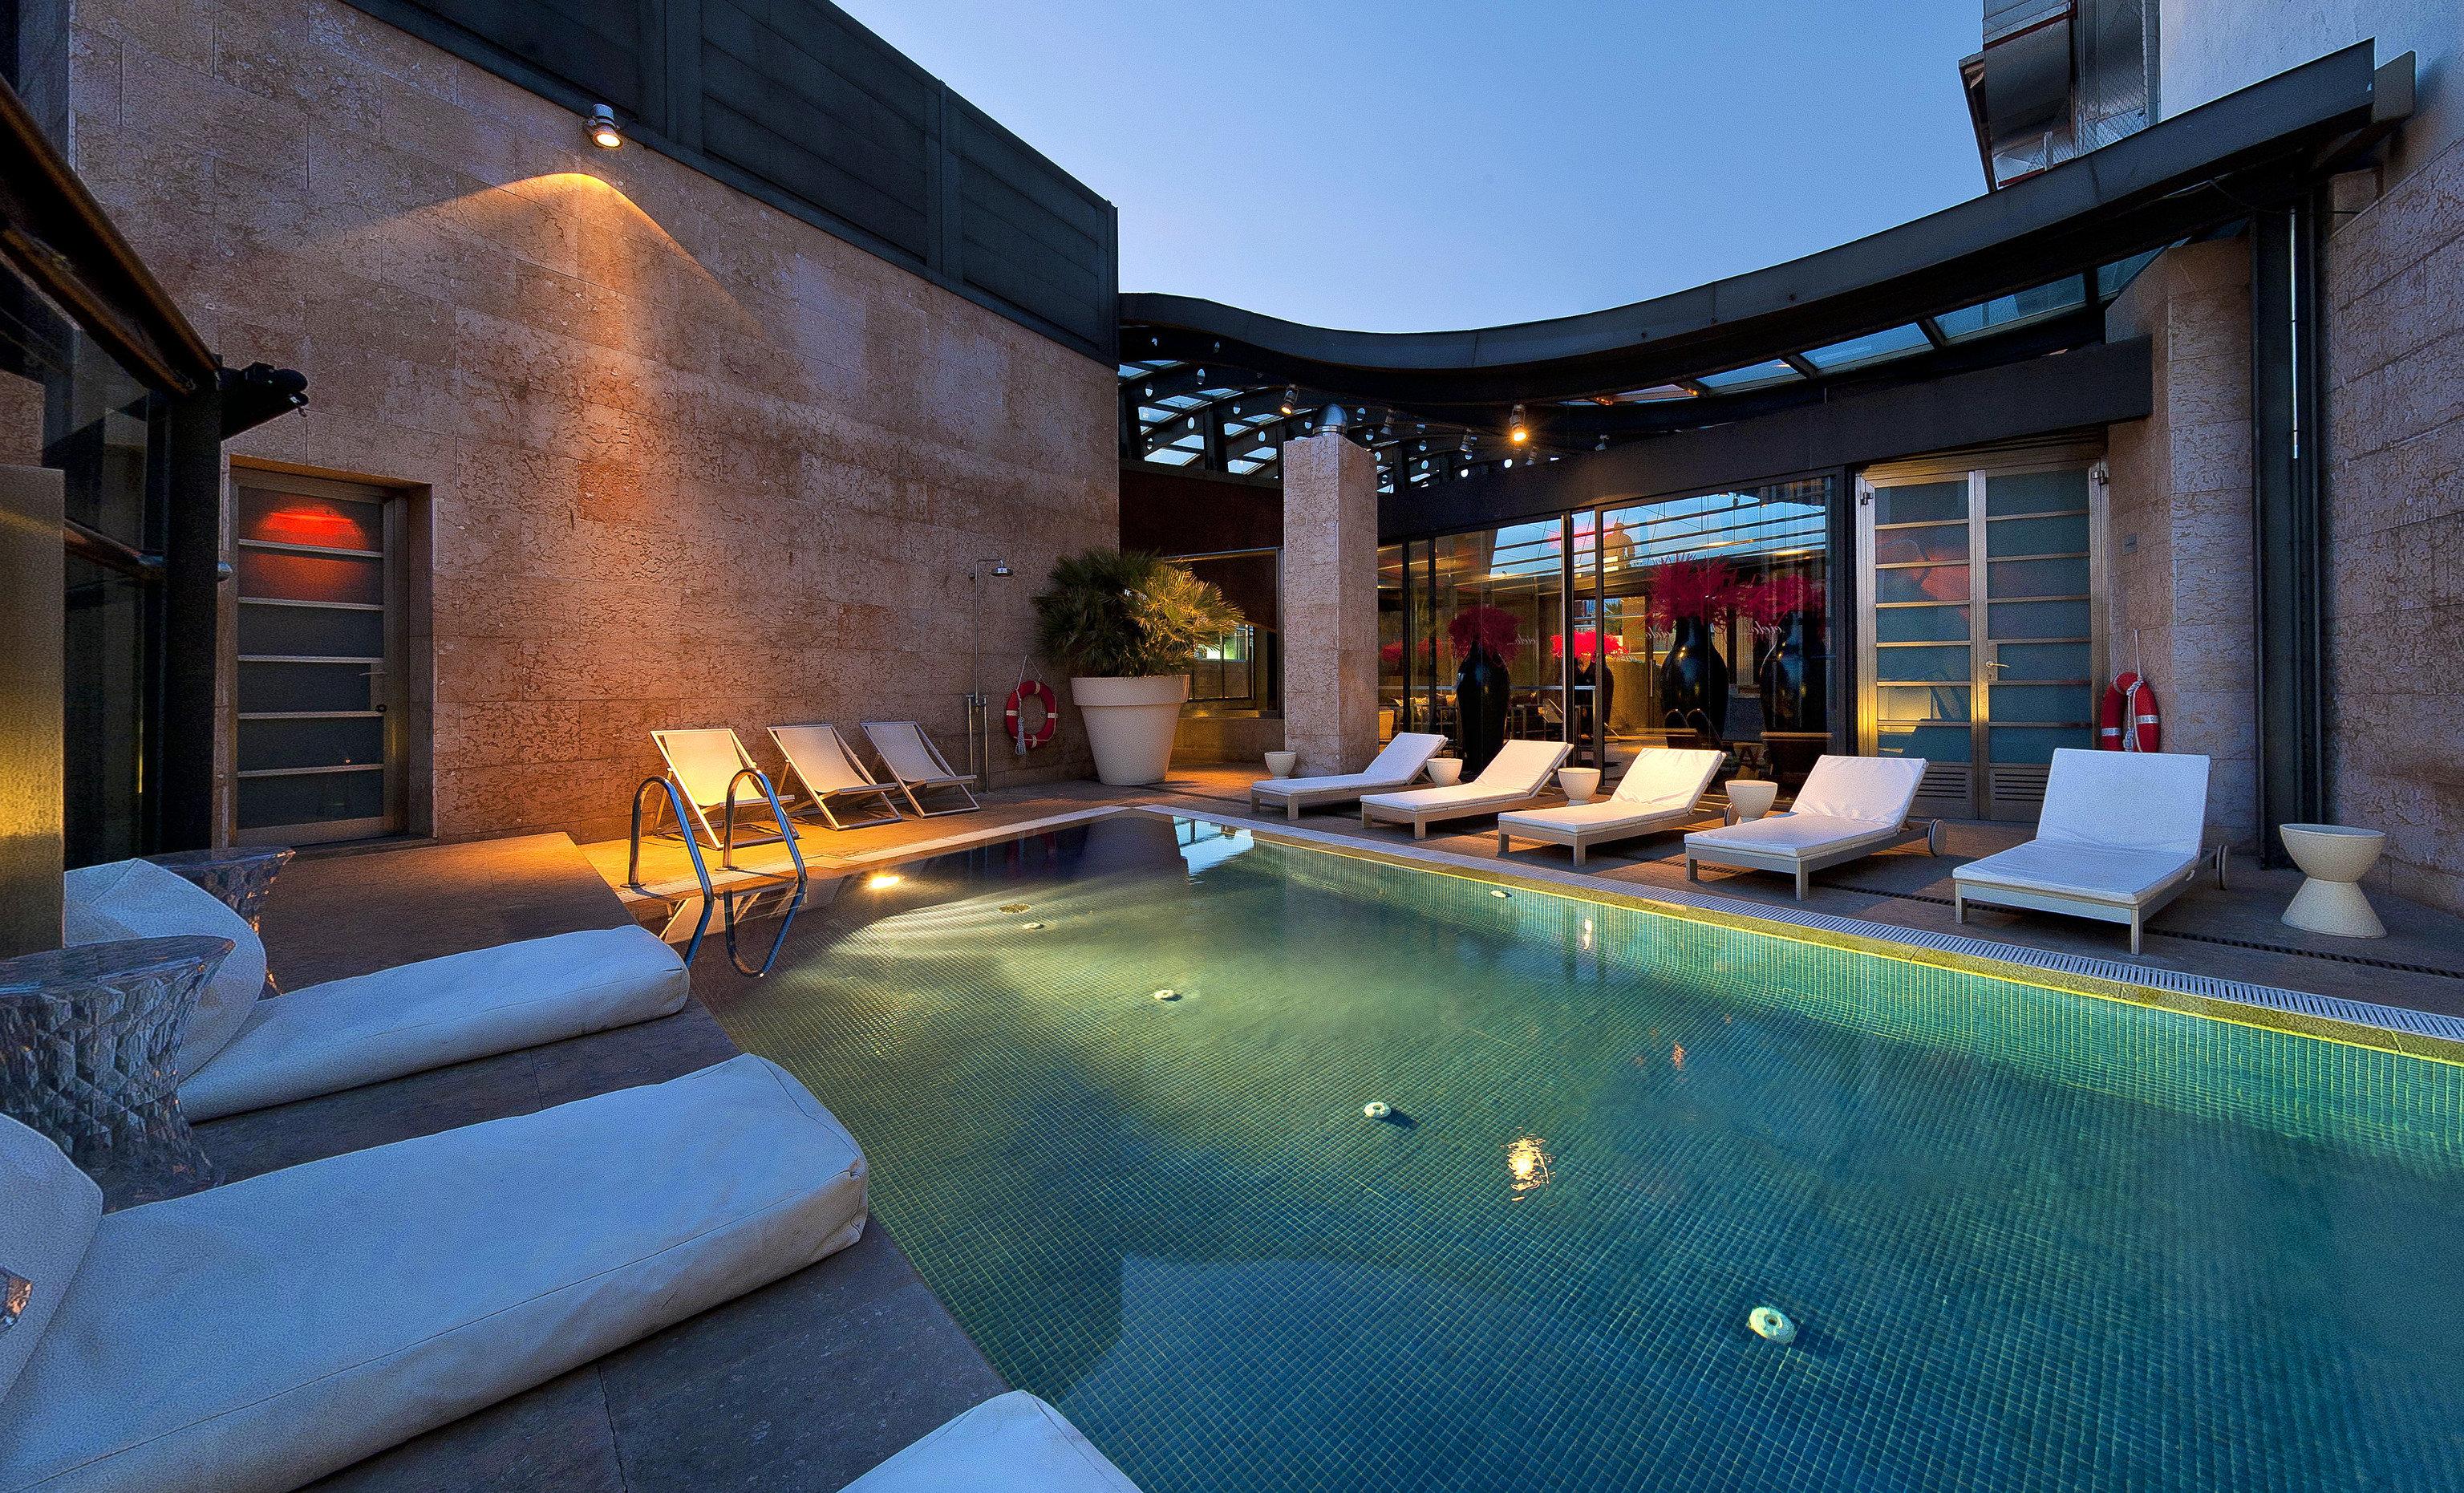 Hotels Madrid Spain swimming pool Living property leisure estate room Resort vacation Villa home backyard mansion real estate